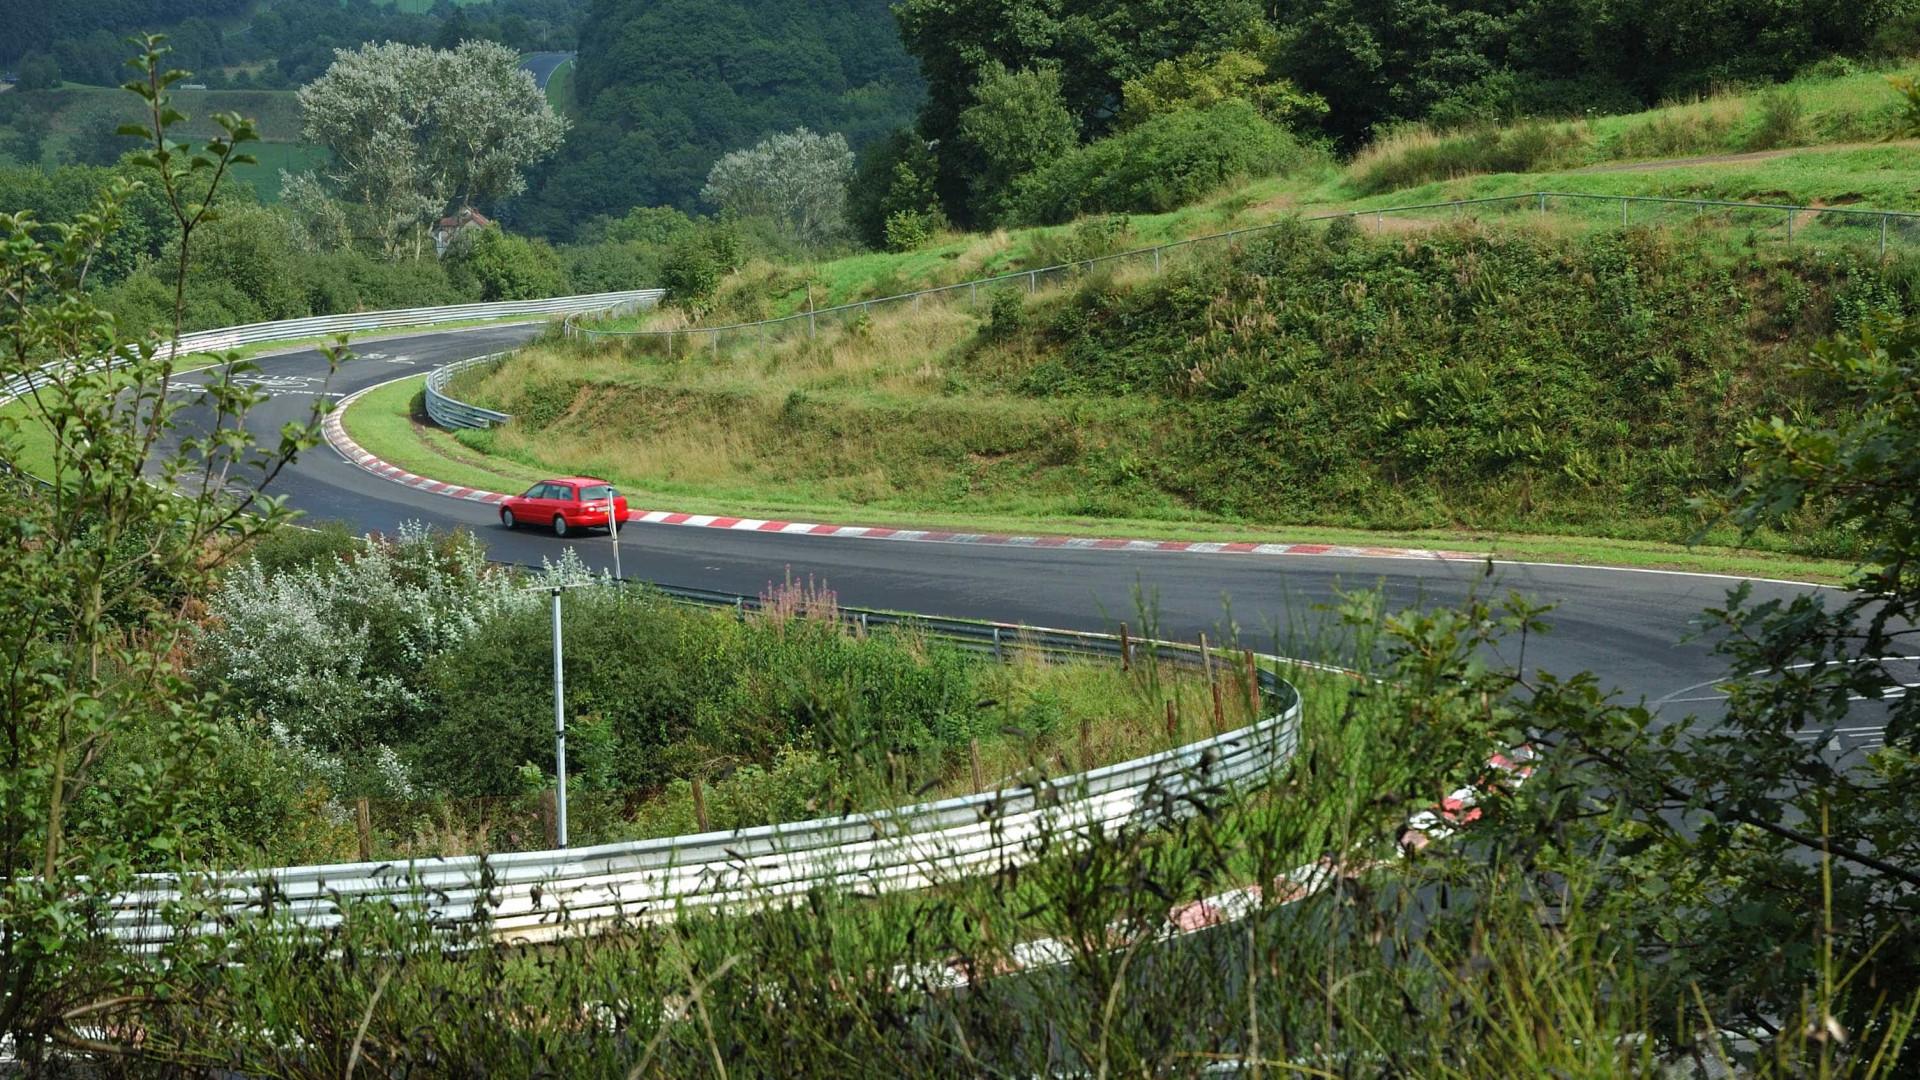 Mini-Schumacher apanhado a conduzir em Nürburgring